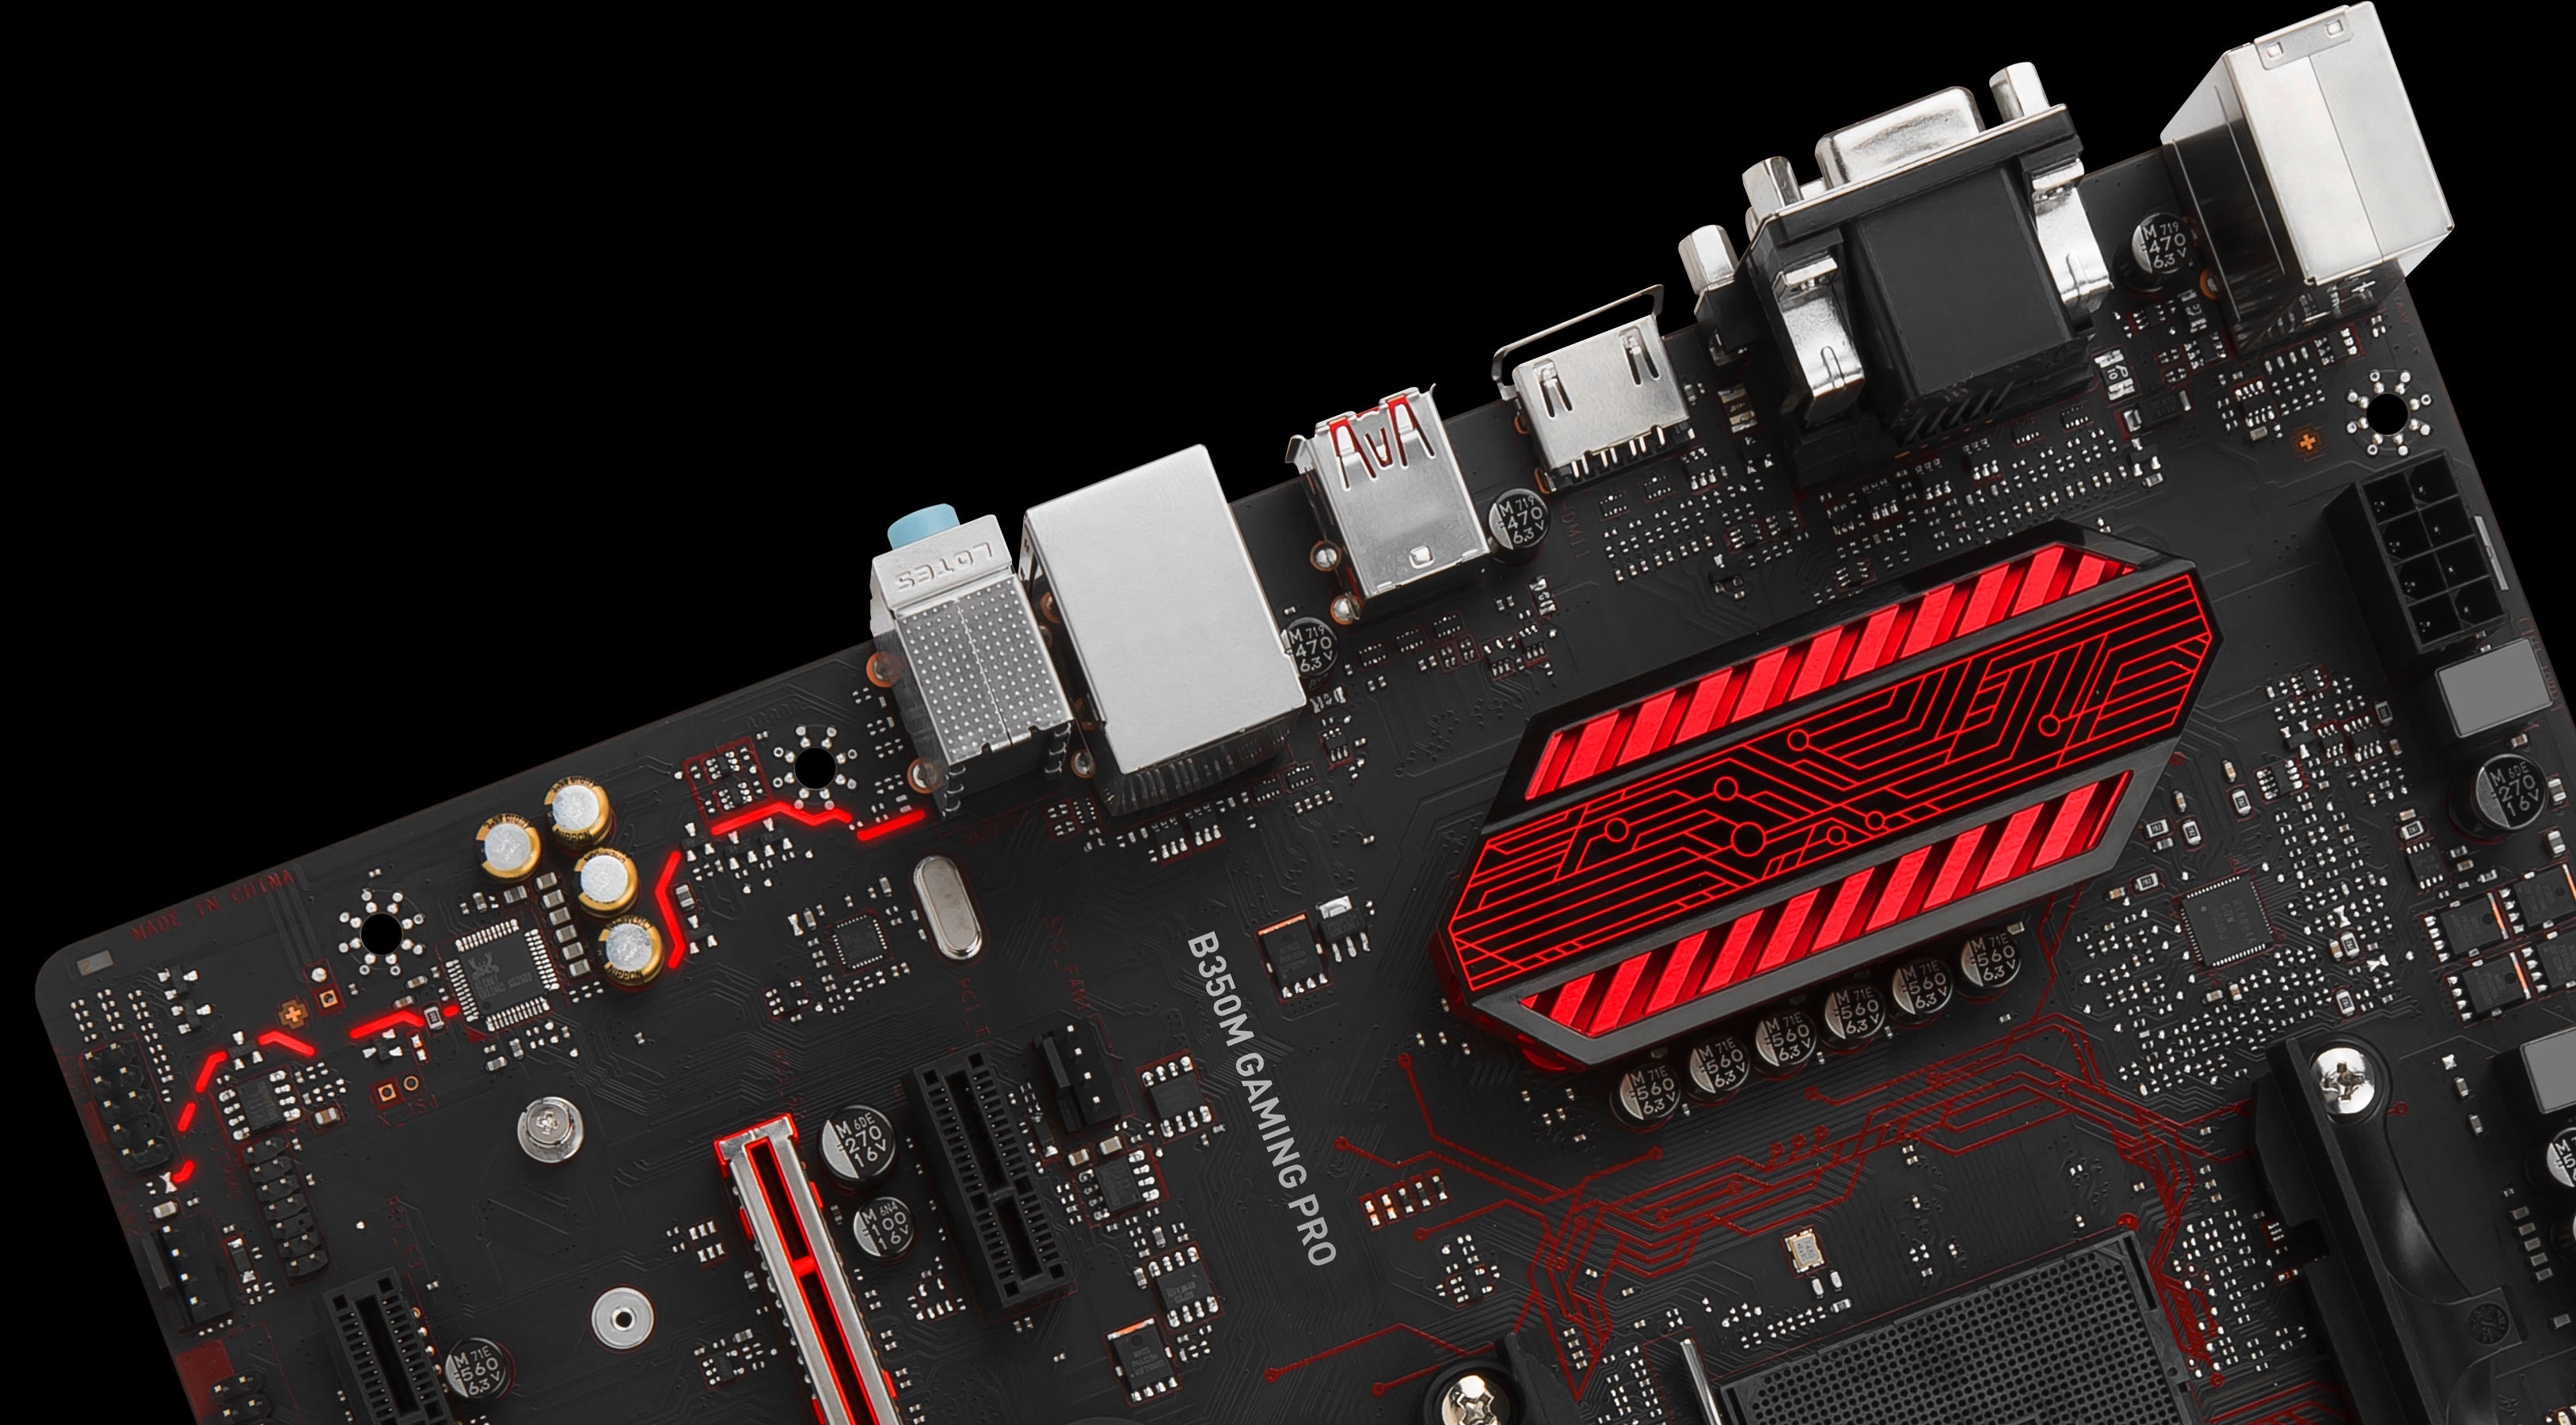 MSI: Le nuove proposte con chipset Intel Z370